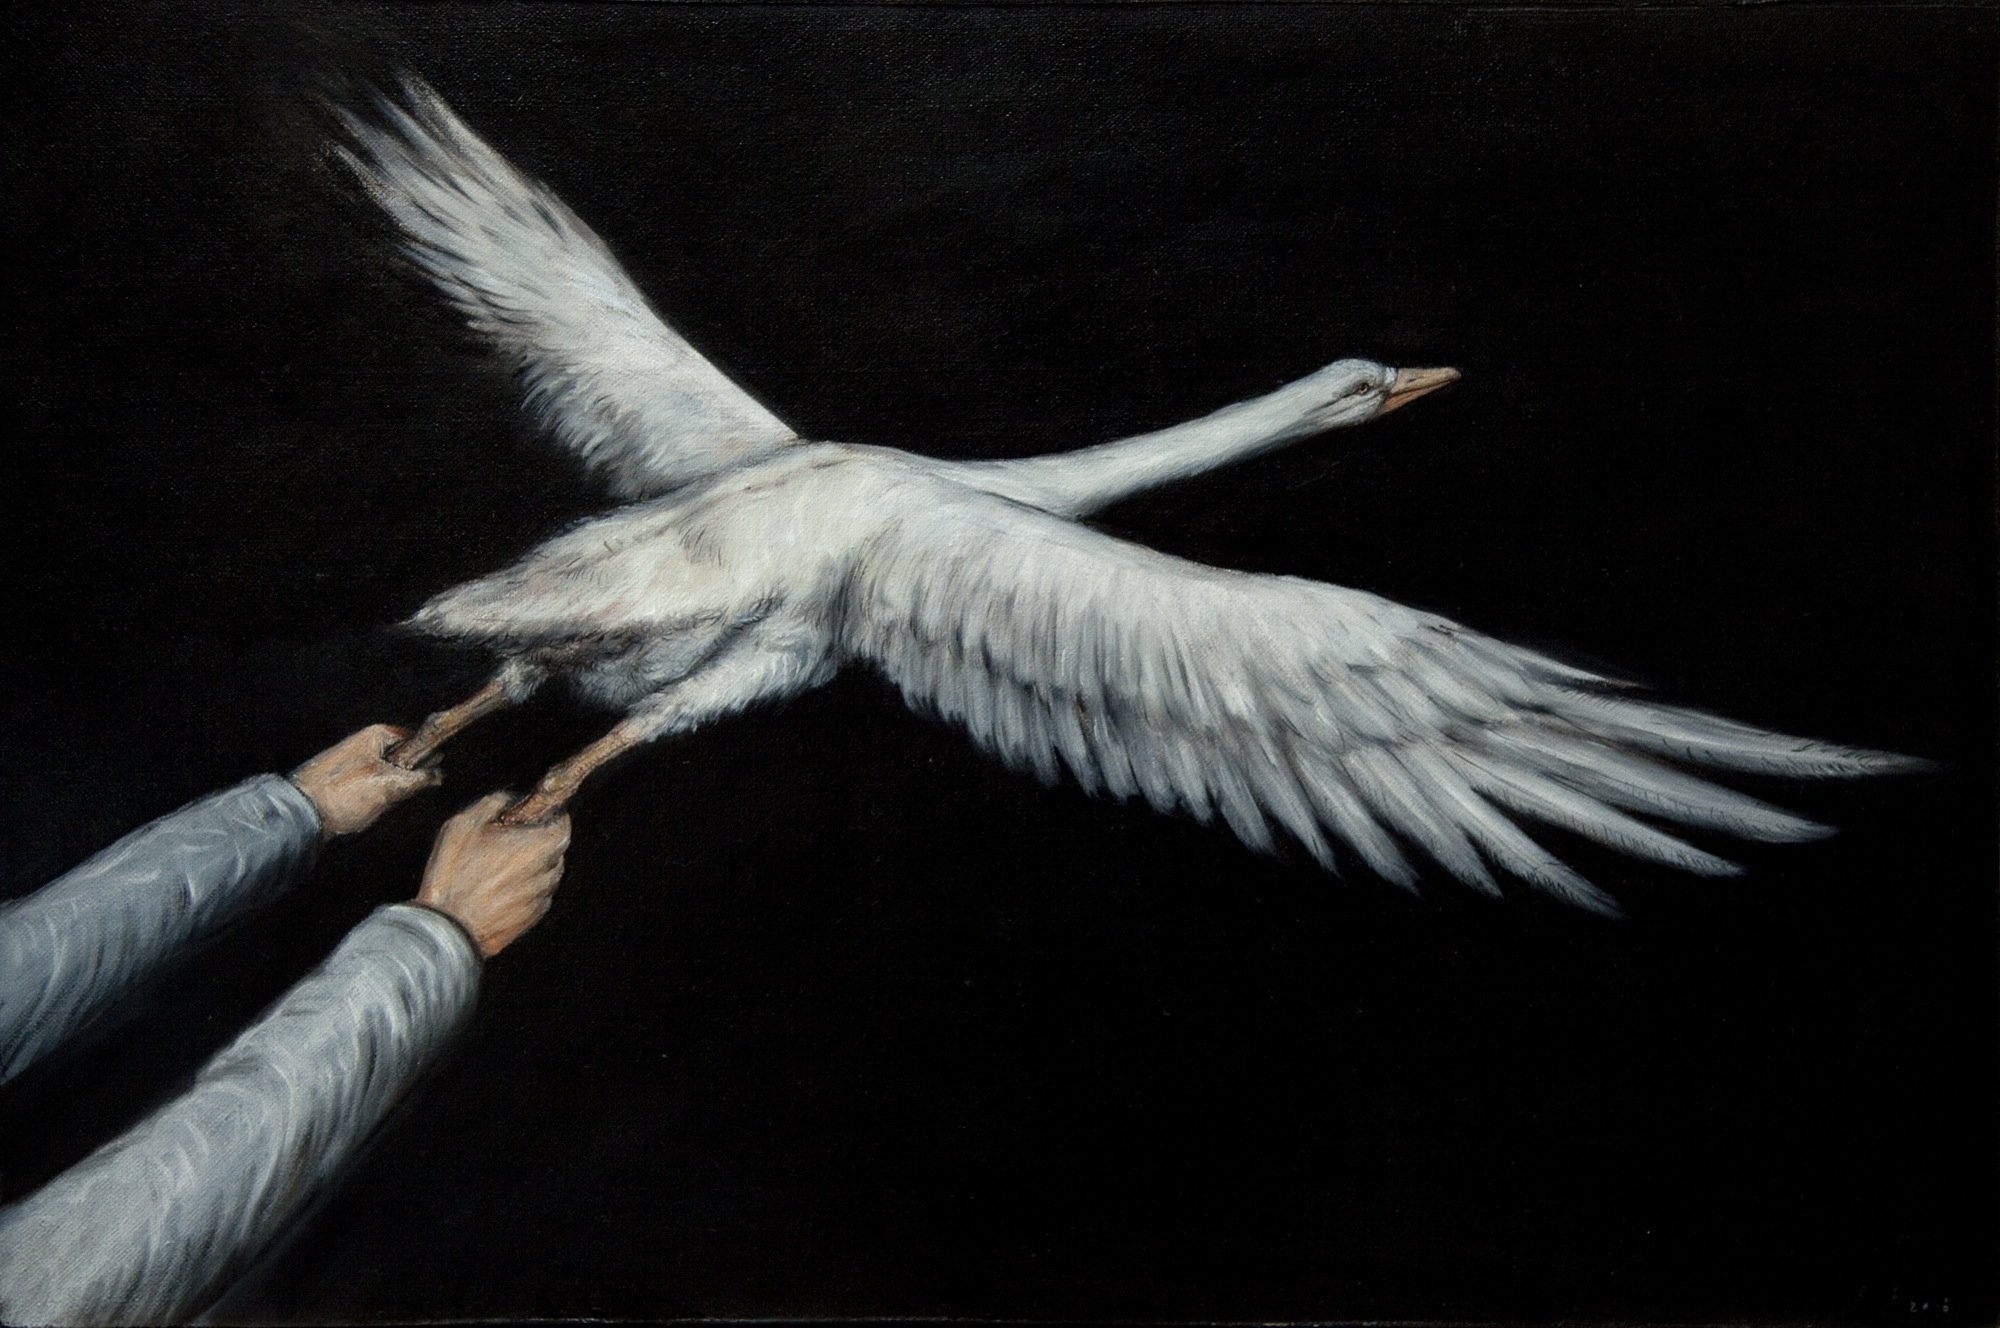 Wu Junyong 吴俊勇, Cruise 邀游记, 2008, Oil on canvas 布面油画, 40 x 60 cm